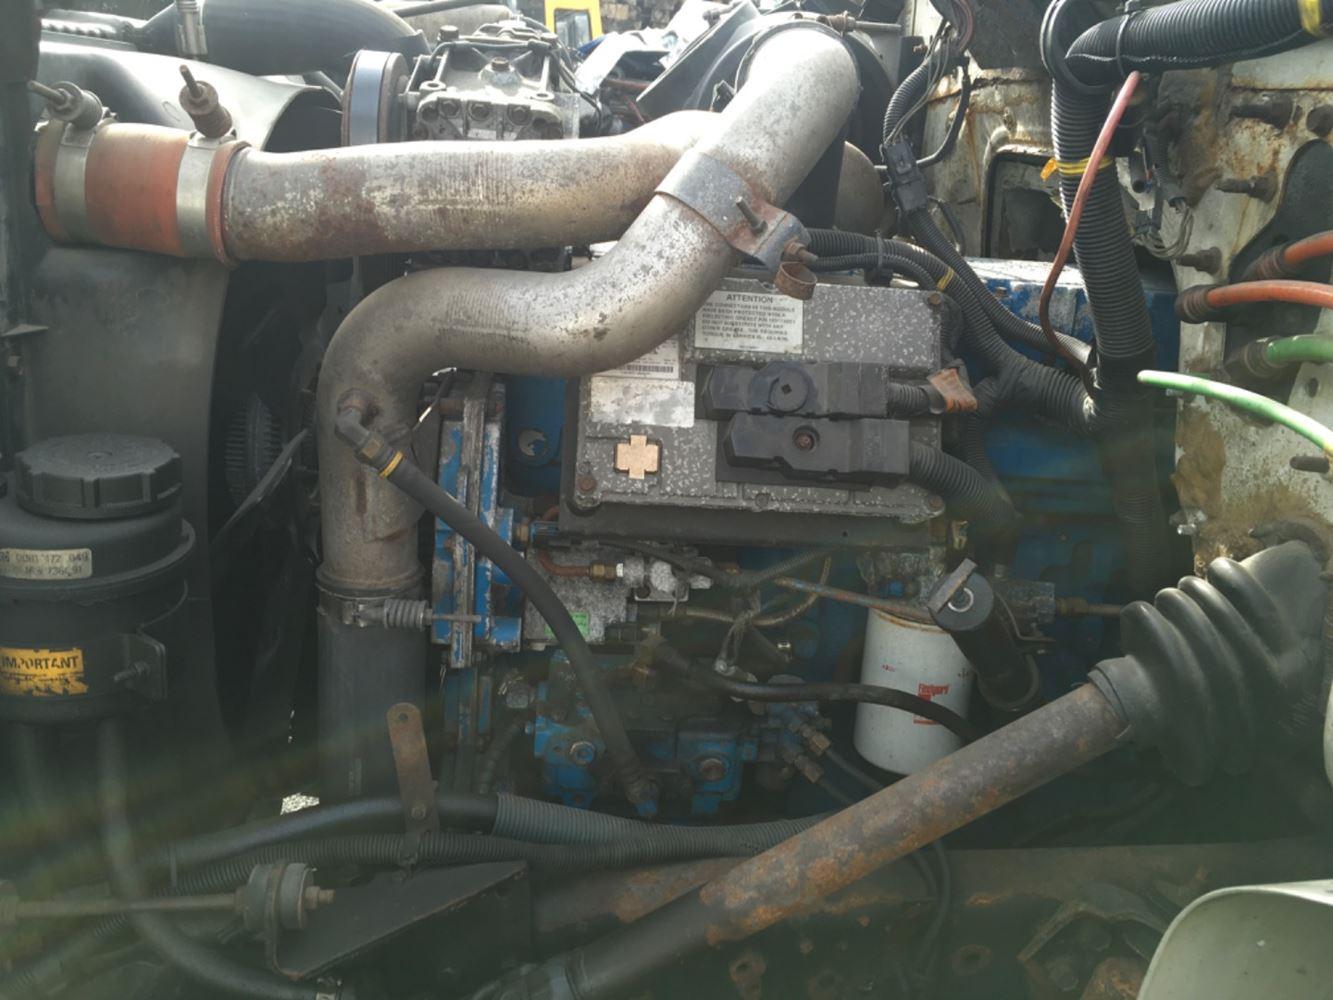 2000 INTERNATIONAL DT466 ENGINE ASSEMBLY TRUCK PARTS #679995